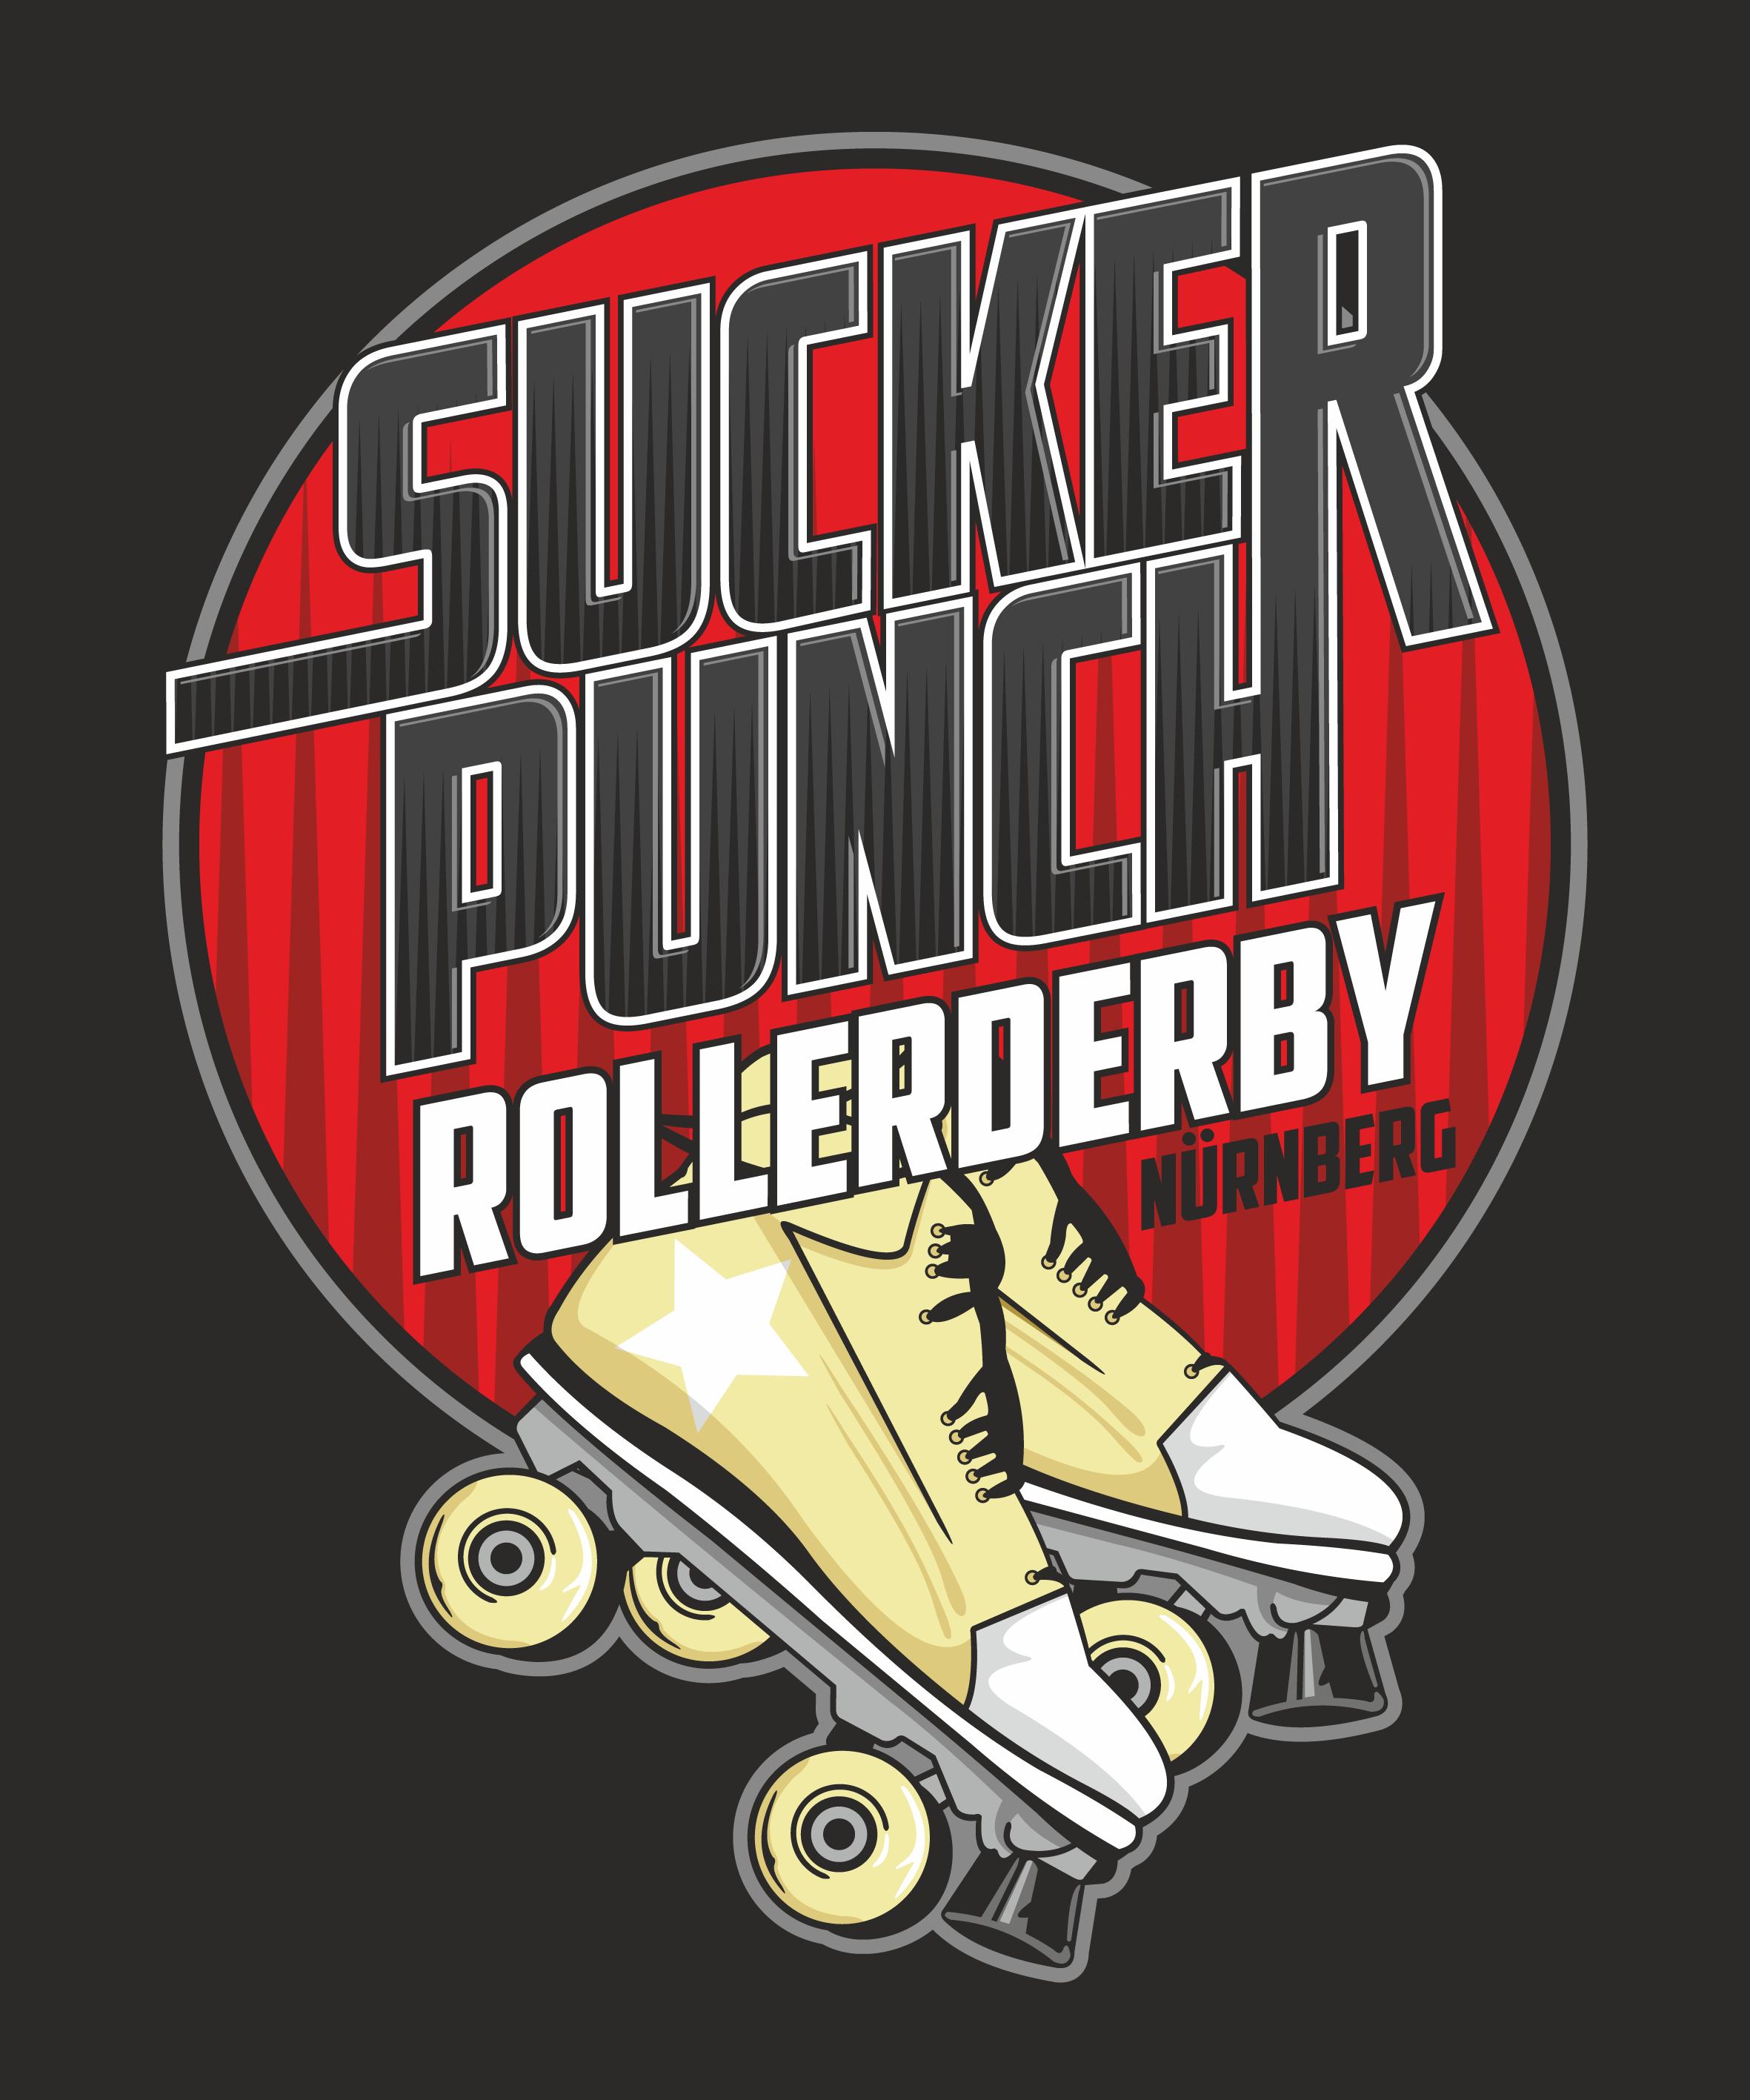 sucker punch roller derby n rnberg special rudeart marenda. Black Bedroom Furniture Sets. Home Design Ideas